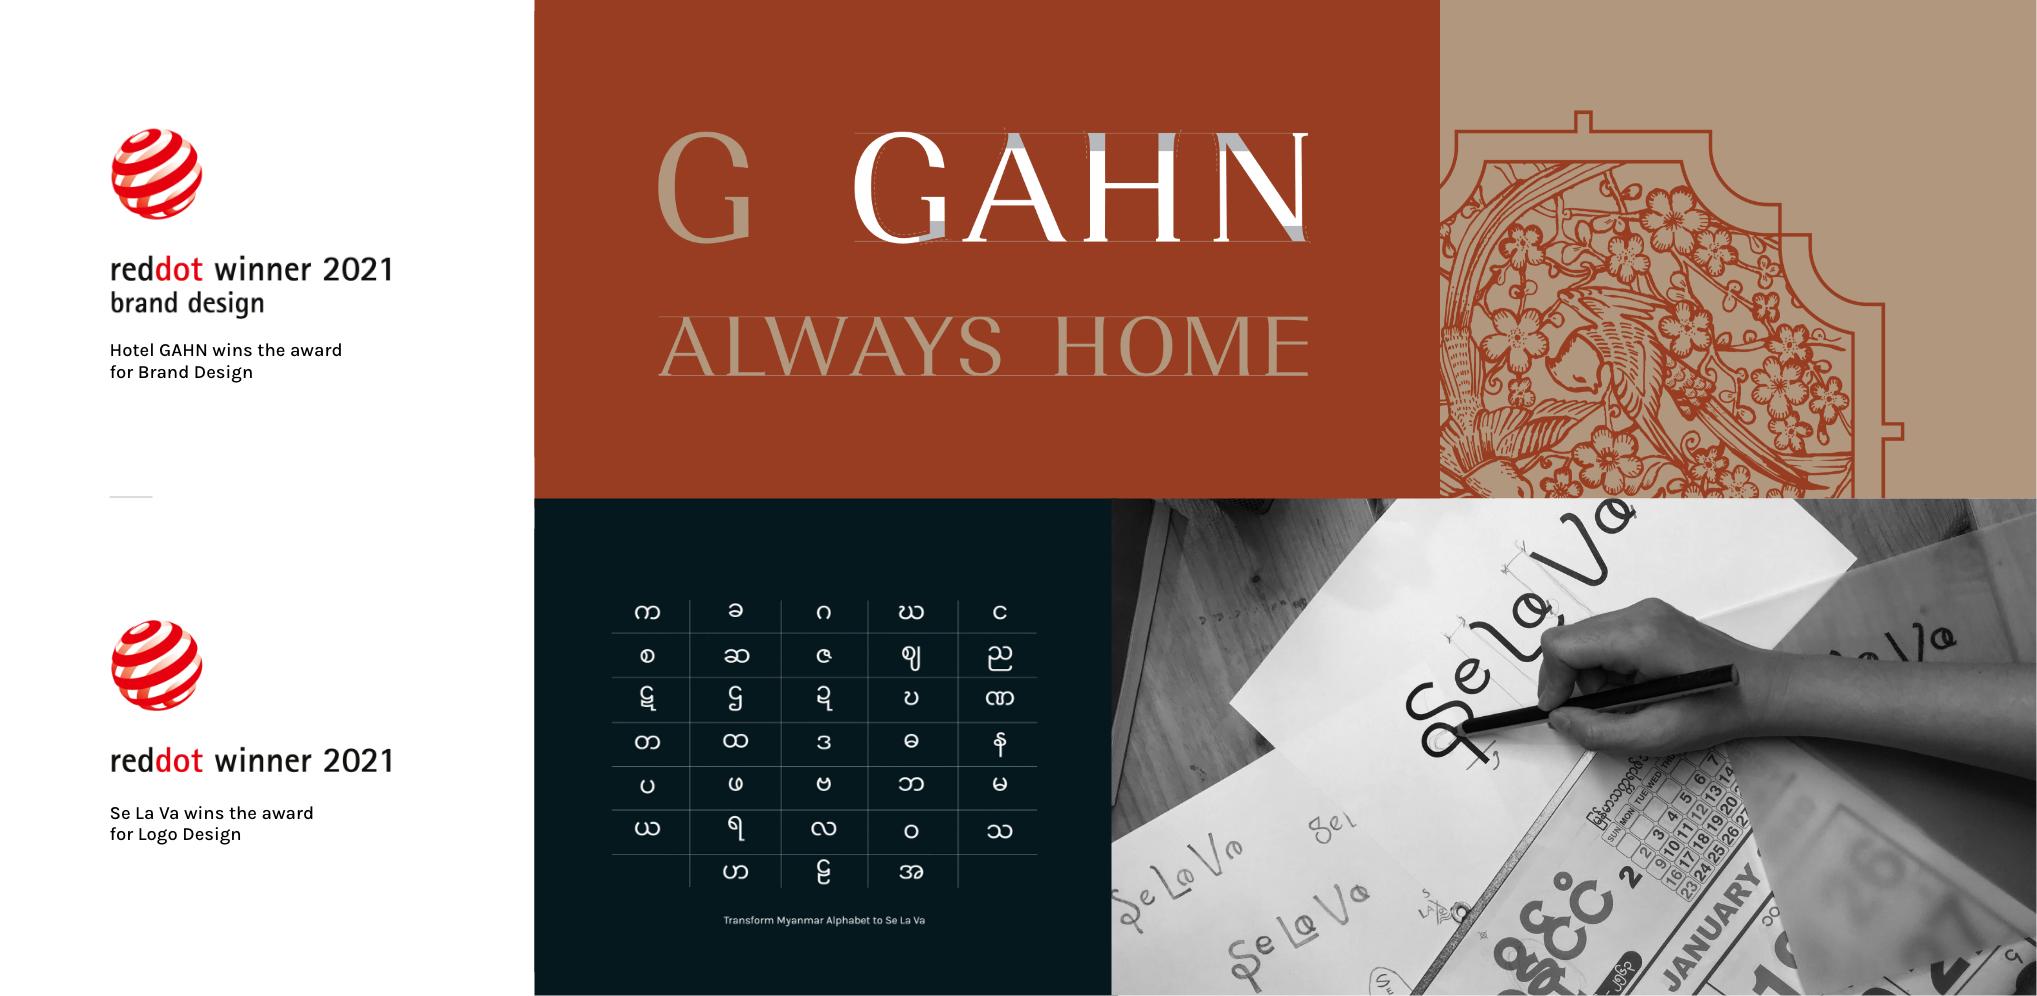 Hotel GAHN and SE LA VA win Red Dot Award Brands & Communication Design 2021 by Simplisis